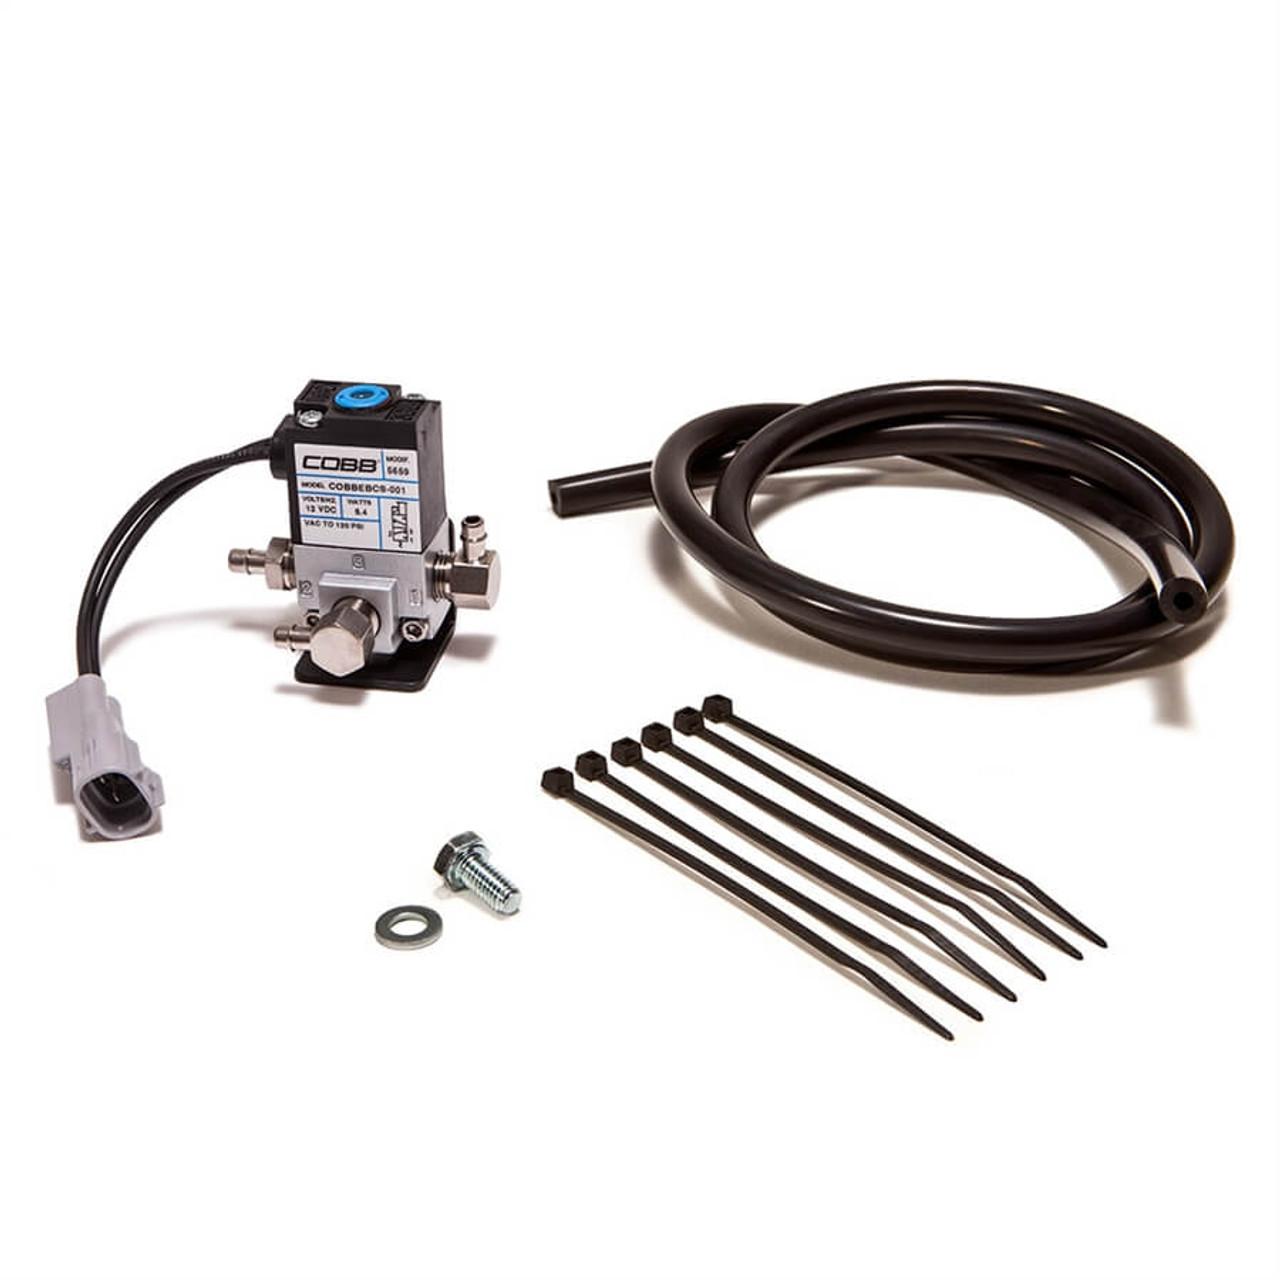 Cobb 3-Port Boost Control Solenoid For 08-14 Subaru WRX / 08-20 STI - 715750